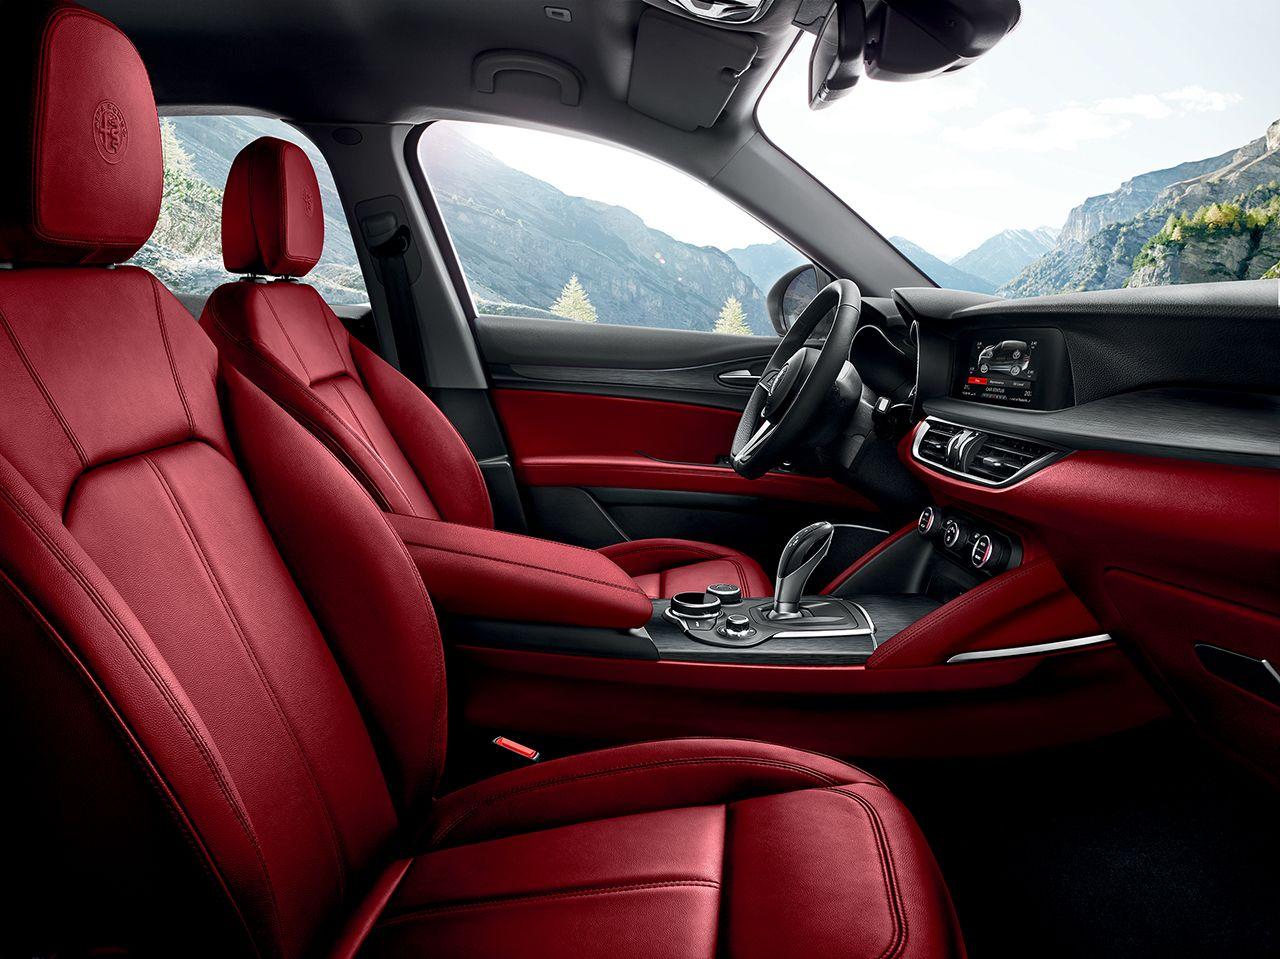 170222 Alfa Romeo Stelvio 100 Νέα έκδοση πετρελαίου 150 ίππων για την Alfa Romeo Stelvio alfa romeo, Alfa Romeo Stelvio, Alfa Romeo SUV, SUV